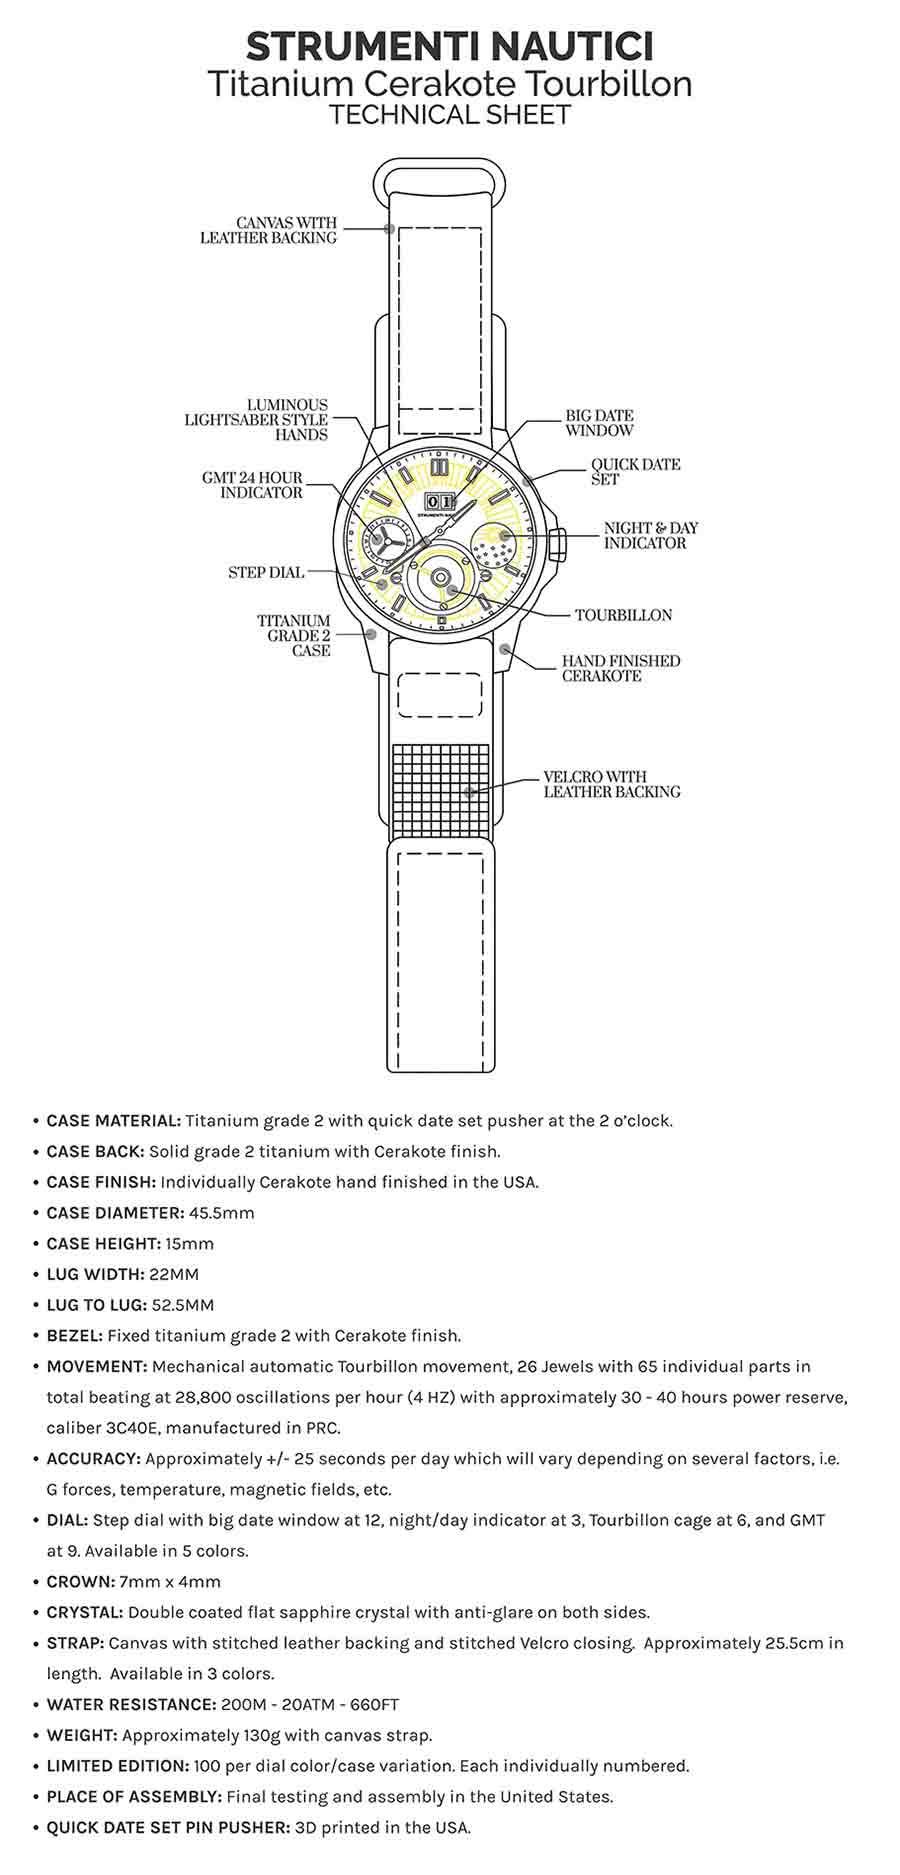 4 Strumenti Nautici Automatic Tourbillon Titanium Cerakote Watch